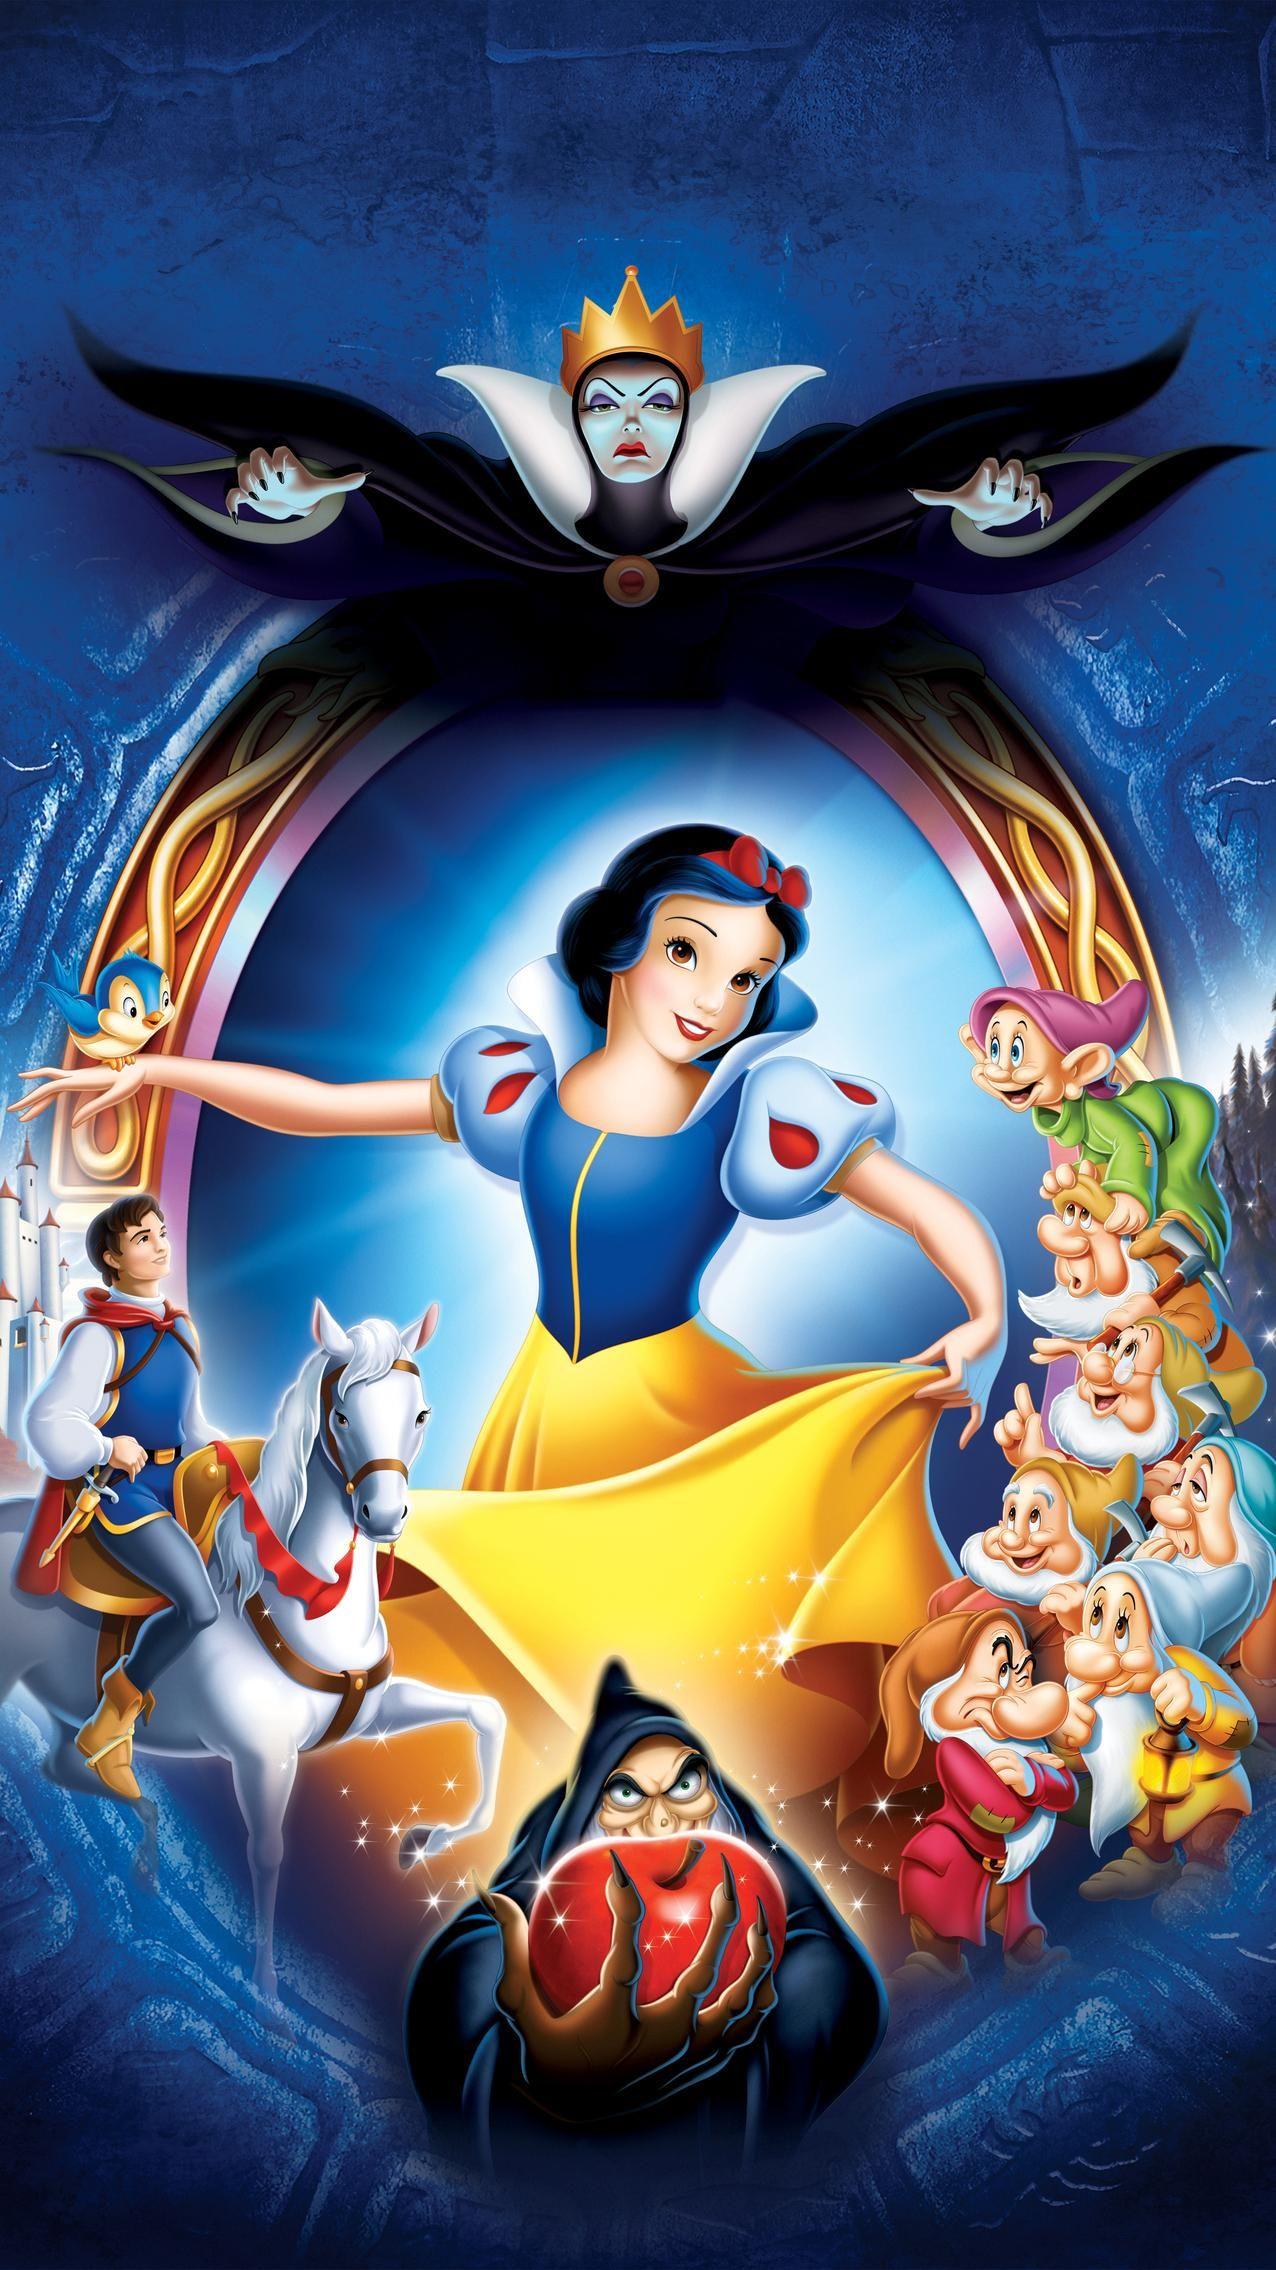 Snow White And The Seven Dwarfs 1937 Phone Wallpaper Moviemania Snow White Movie Snow White Disney Princess Fan Art